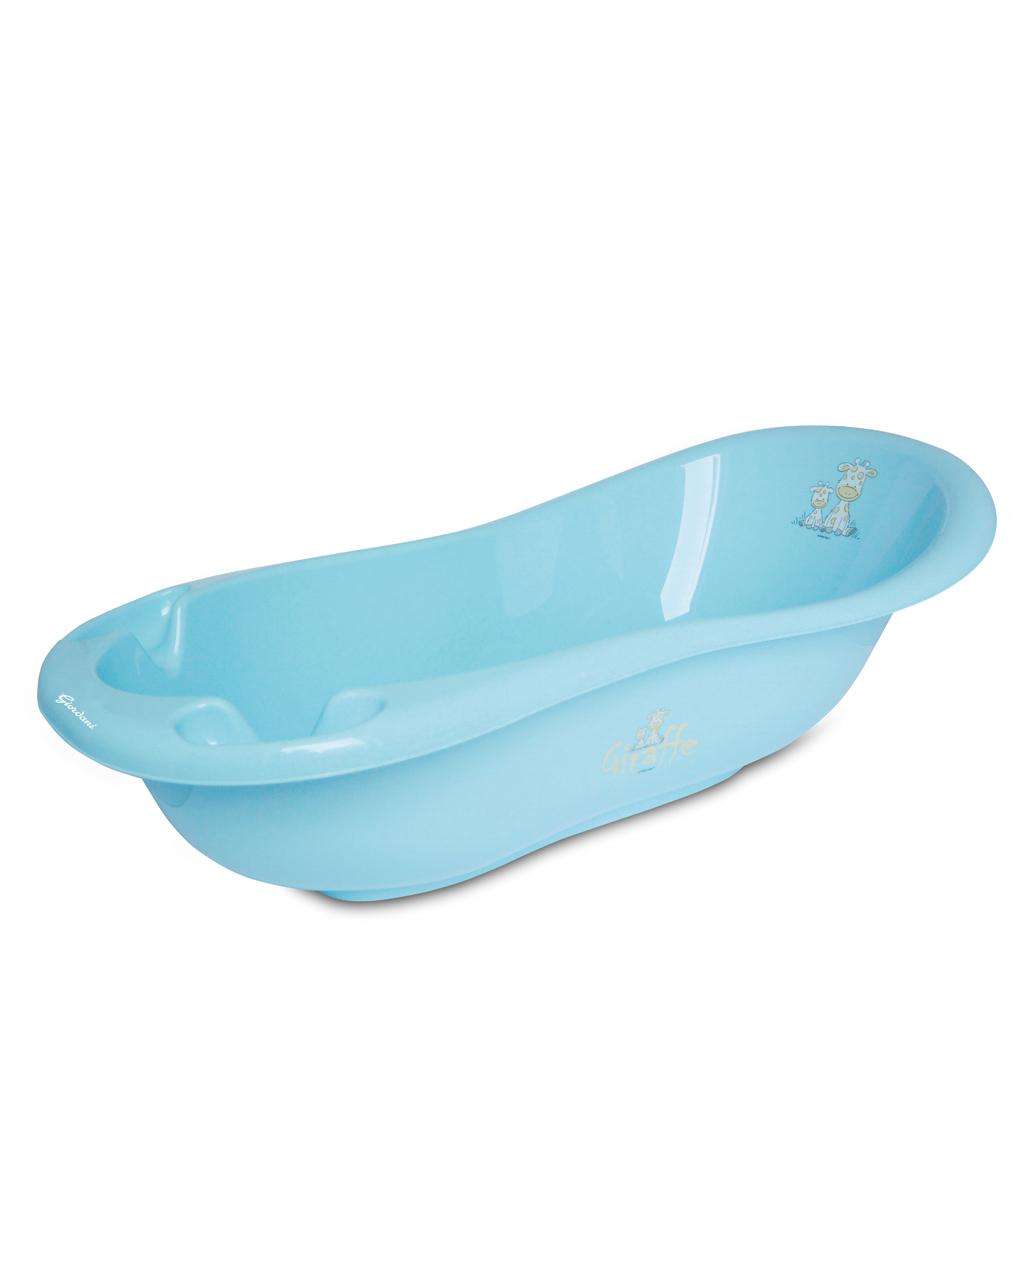 Vasca da bagno basic giraffa blu - Giordani